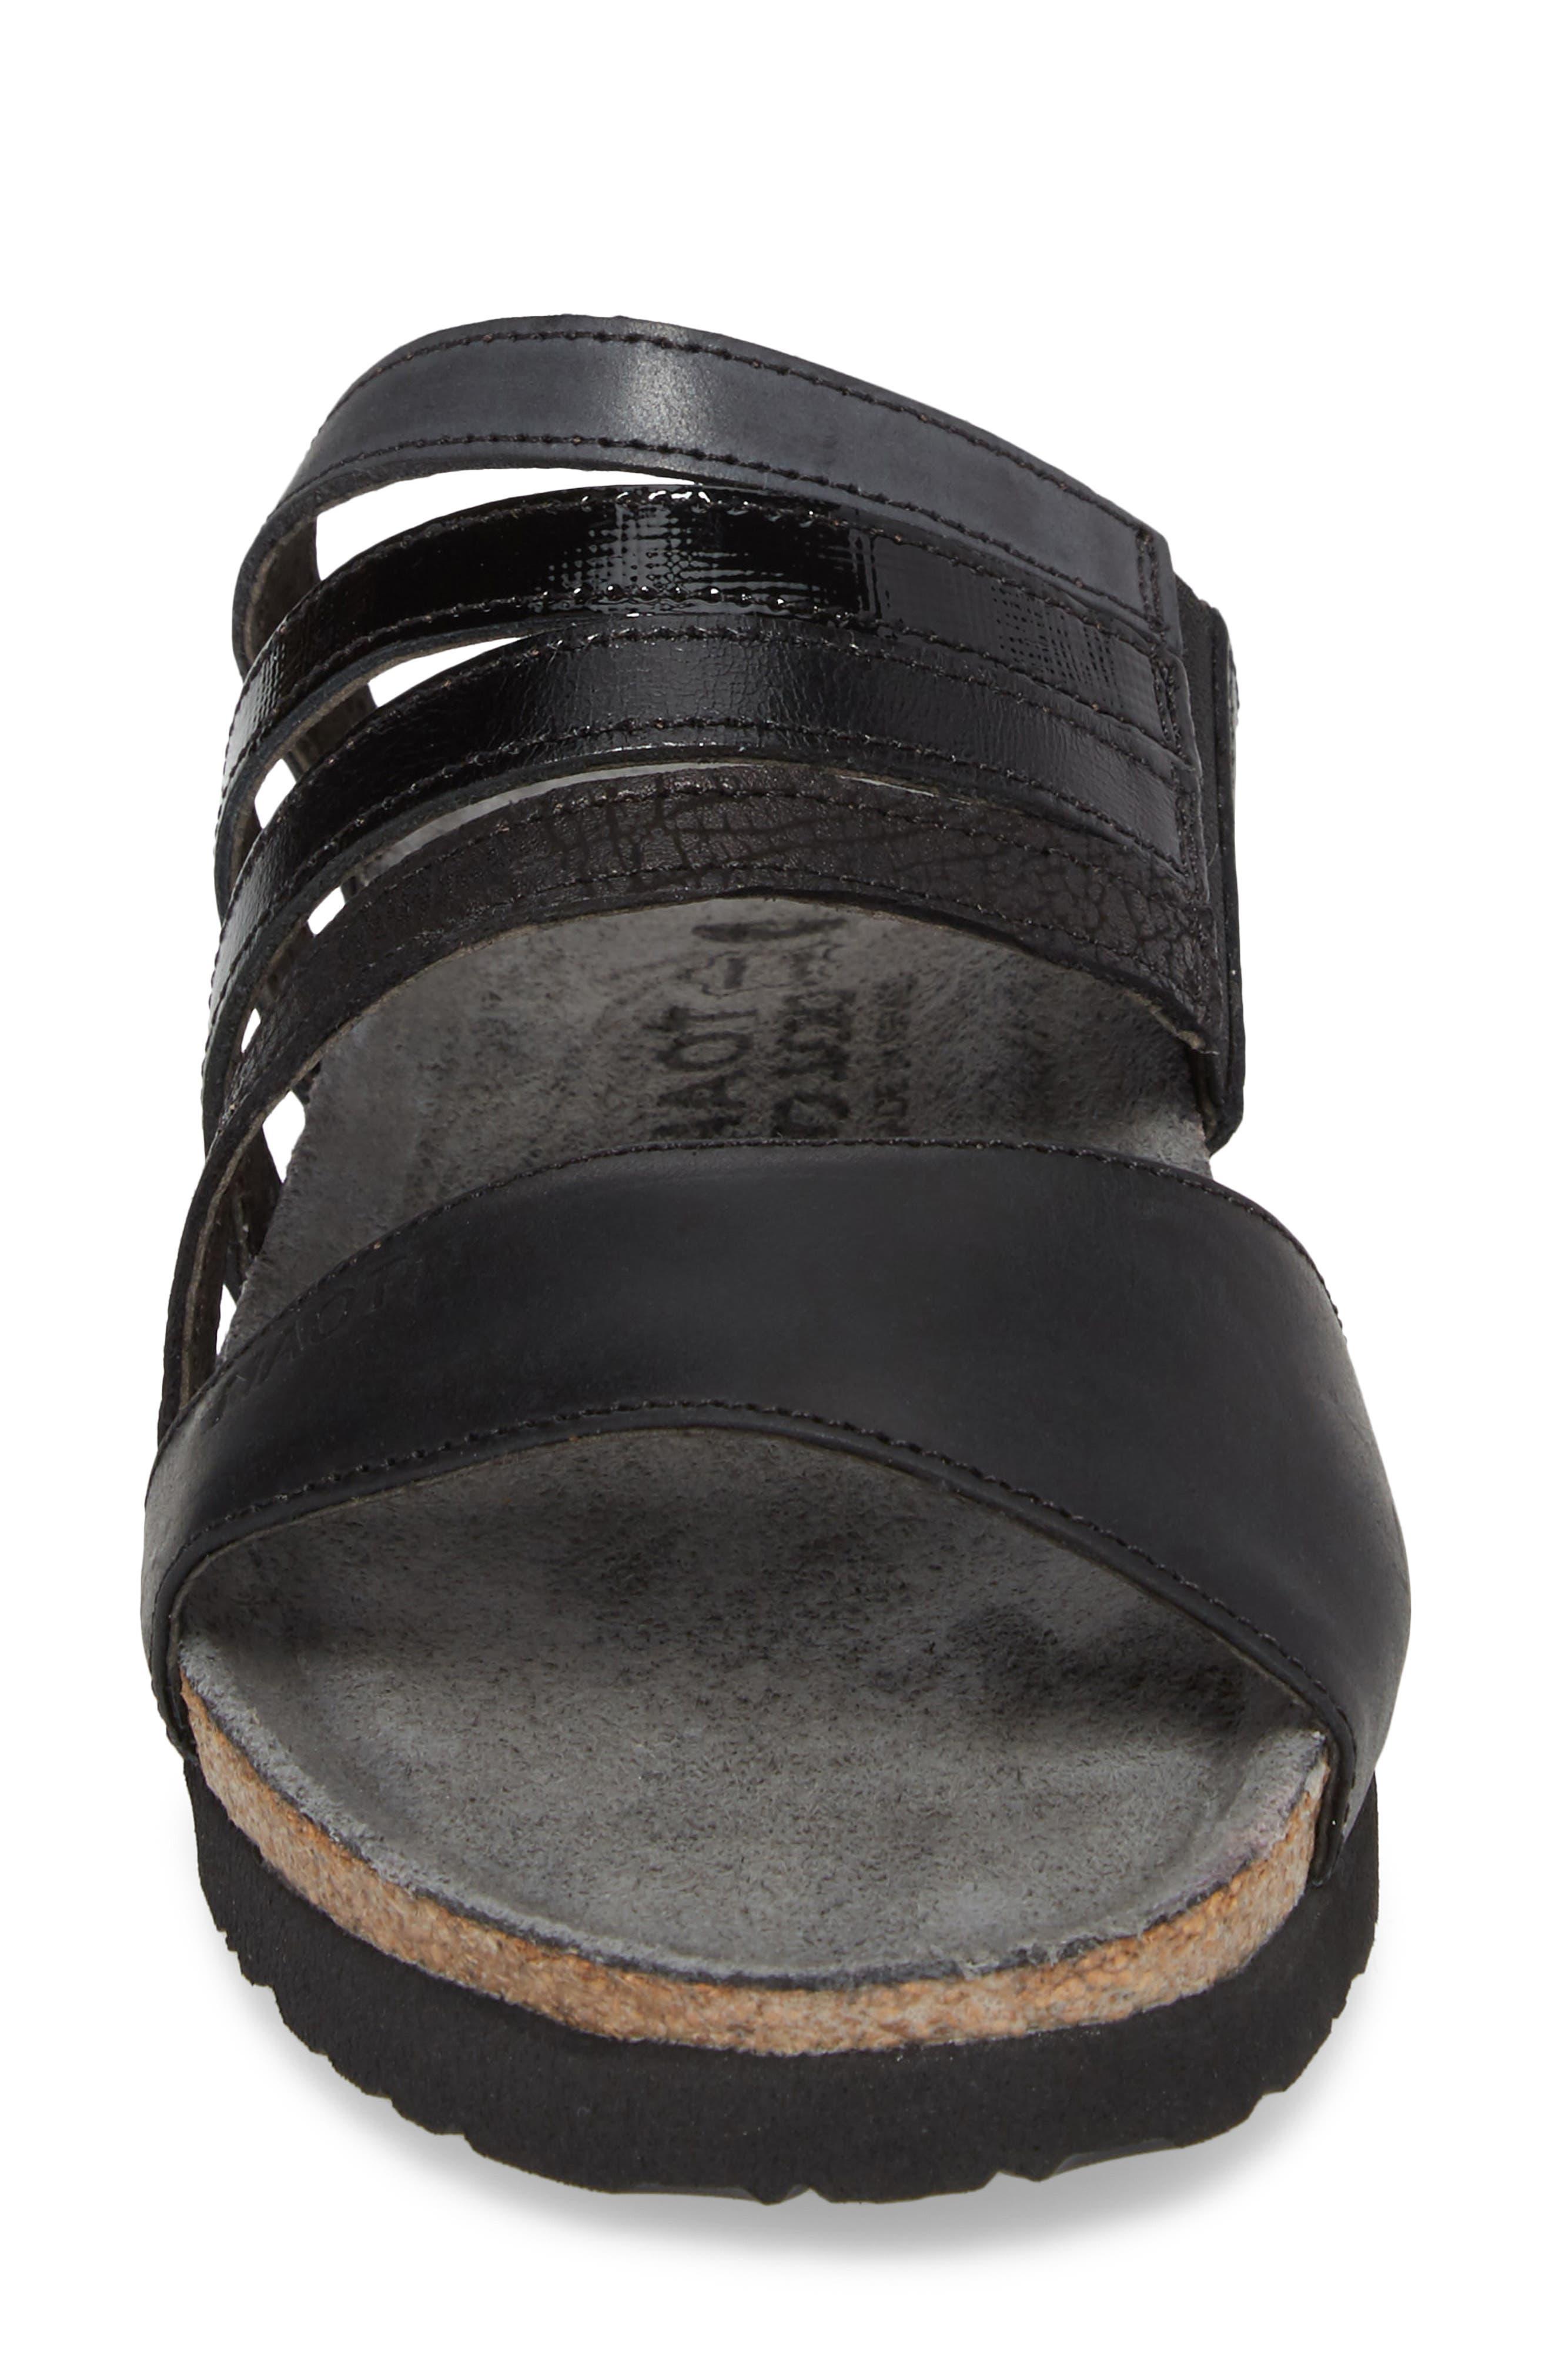 Peyton Slide Sandal,                             Alternate thumbnail 4, color,                             OILY COAL NUBUCK